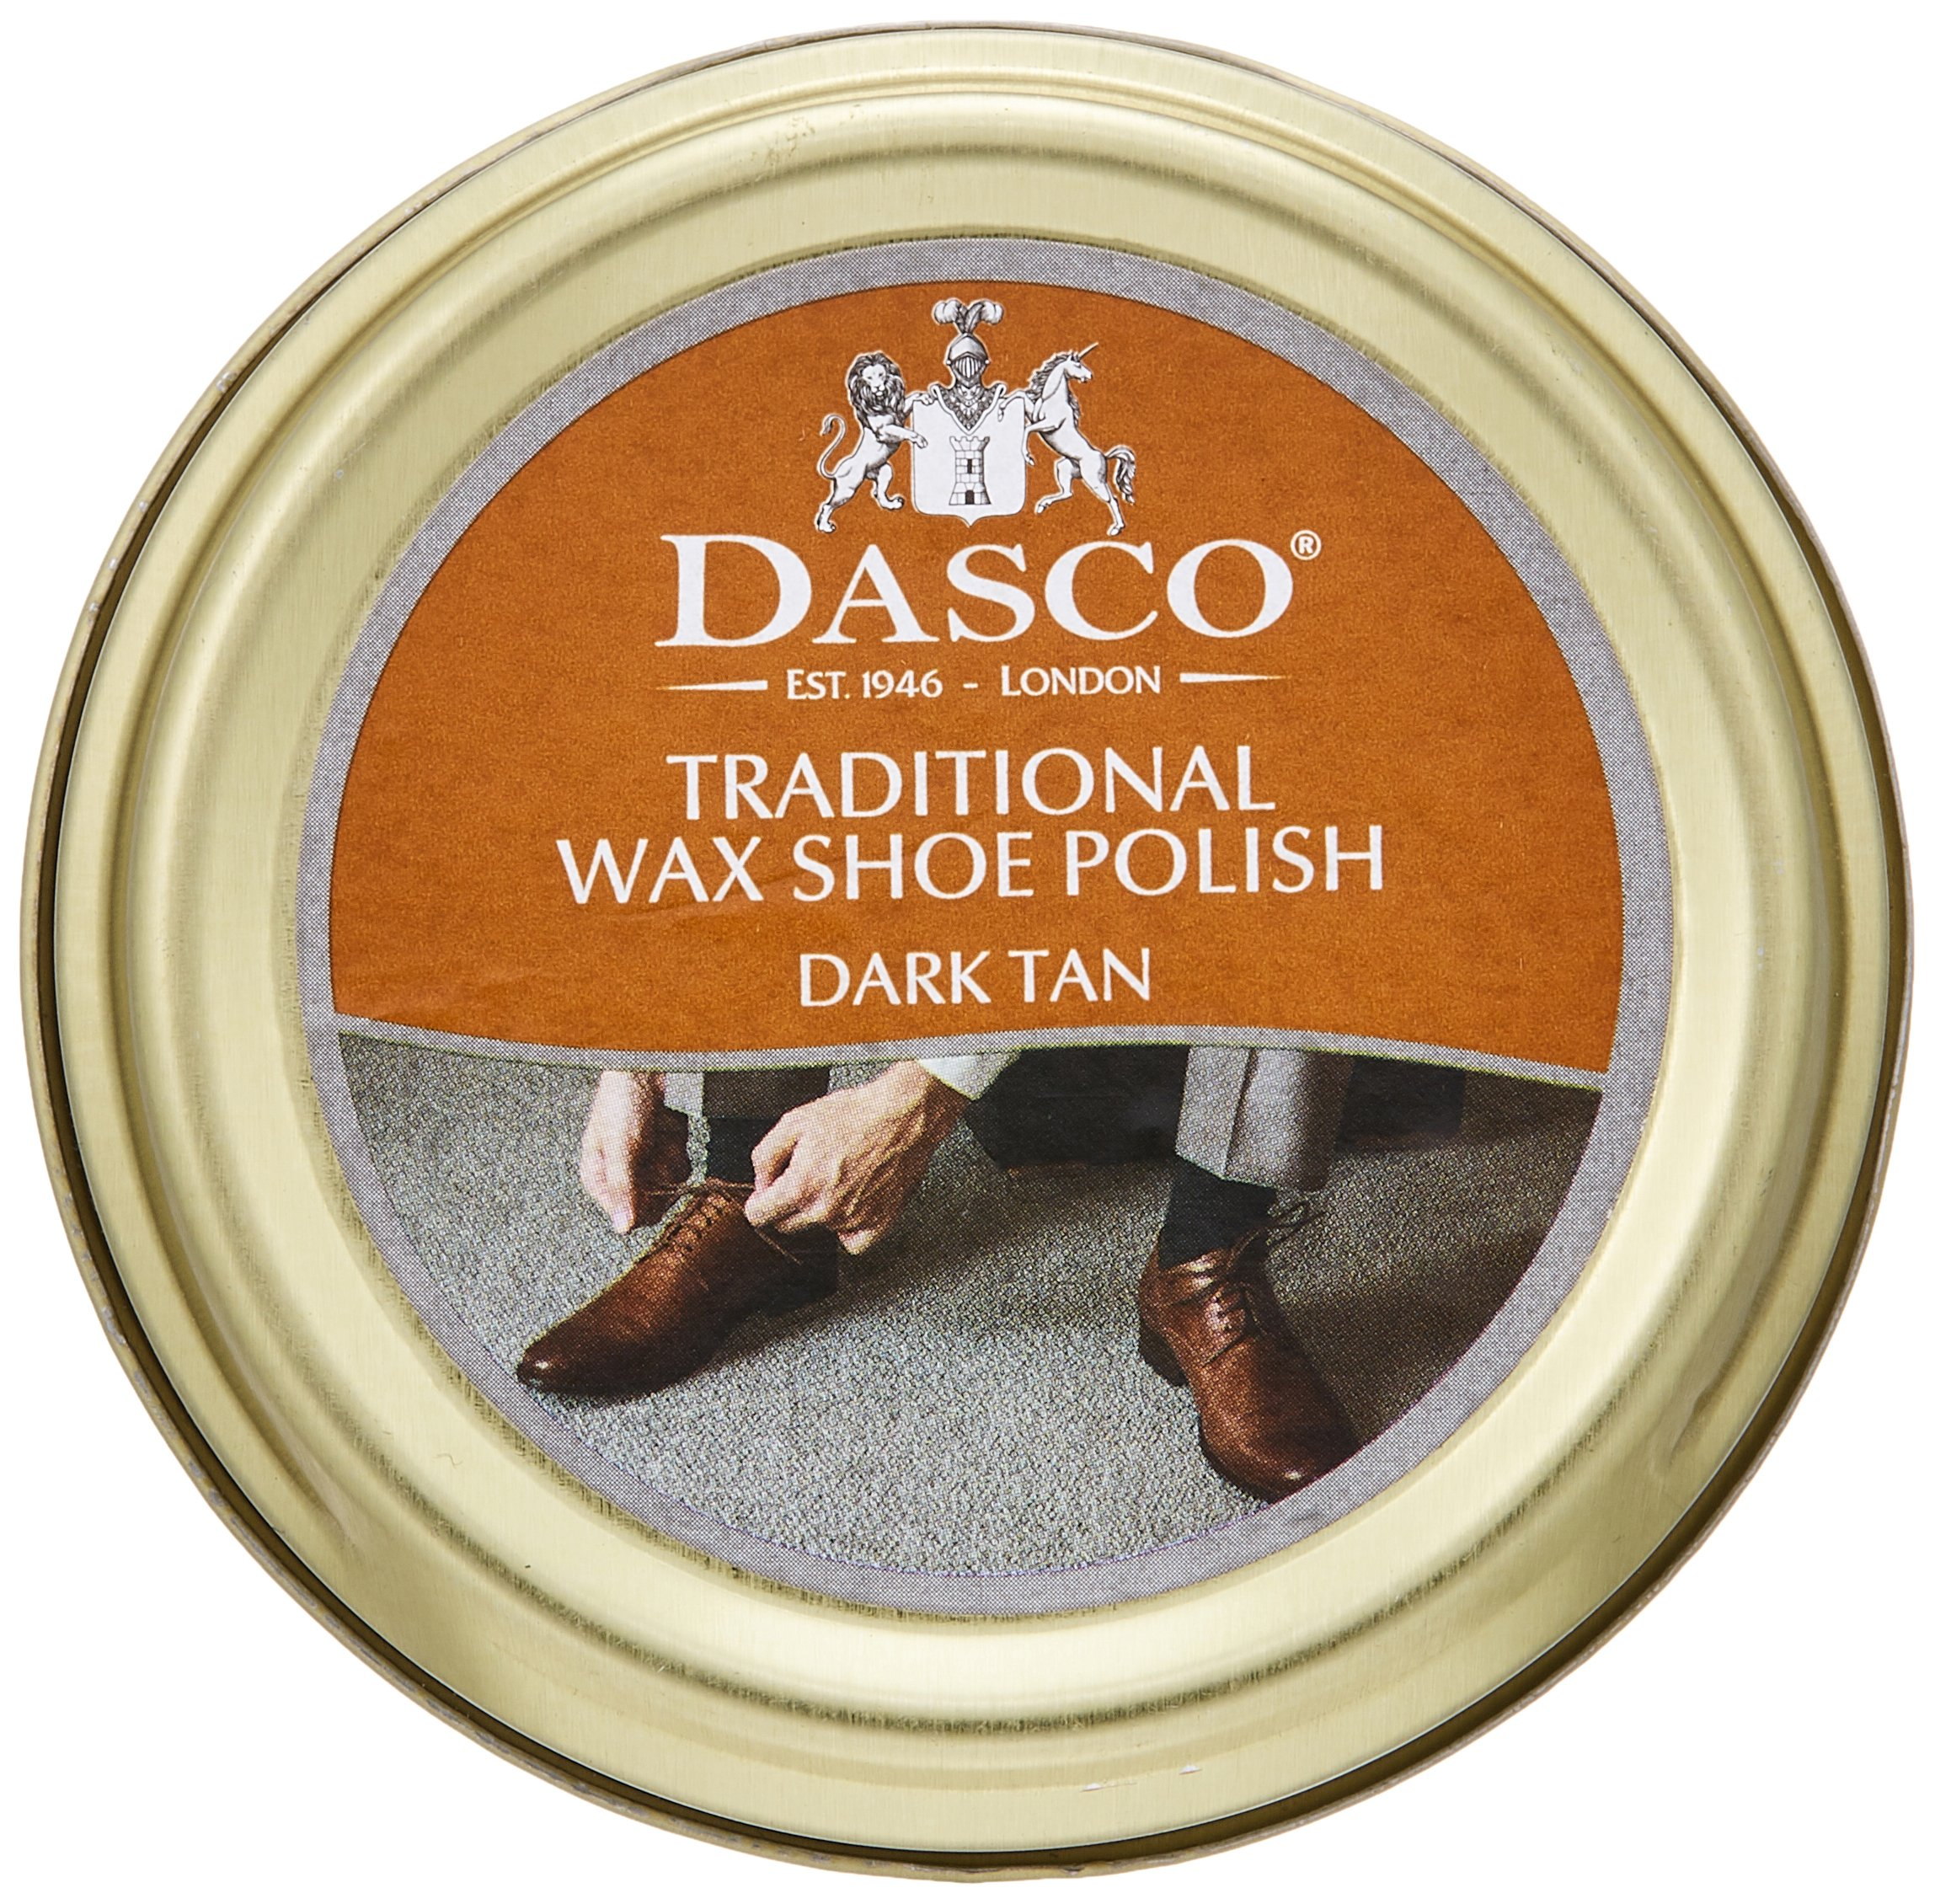 Dasco Traditional Wax Shoe Polish, 50ml tin (Dark Tan)